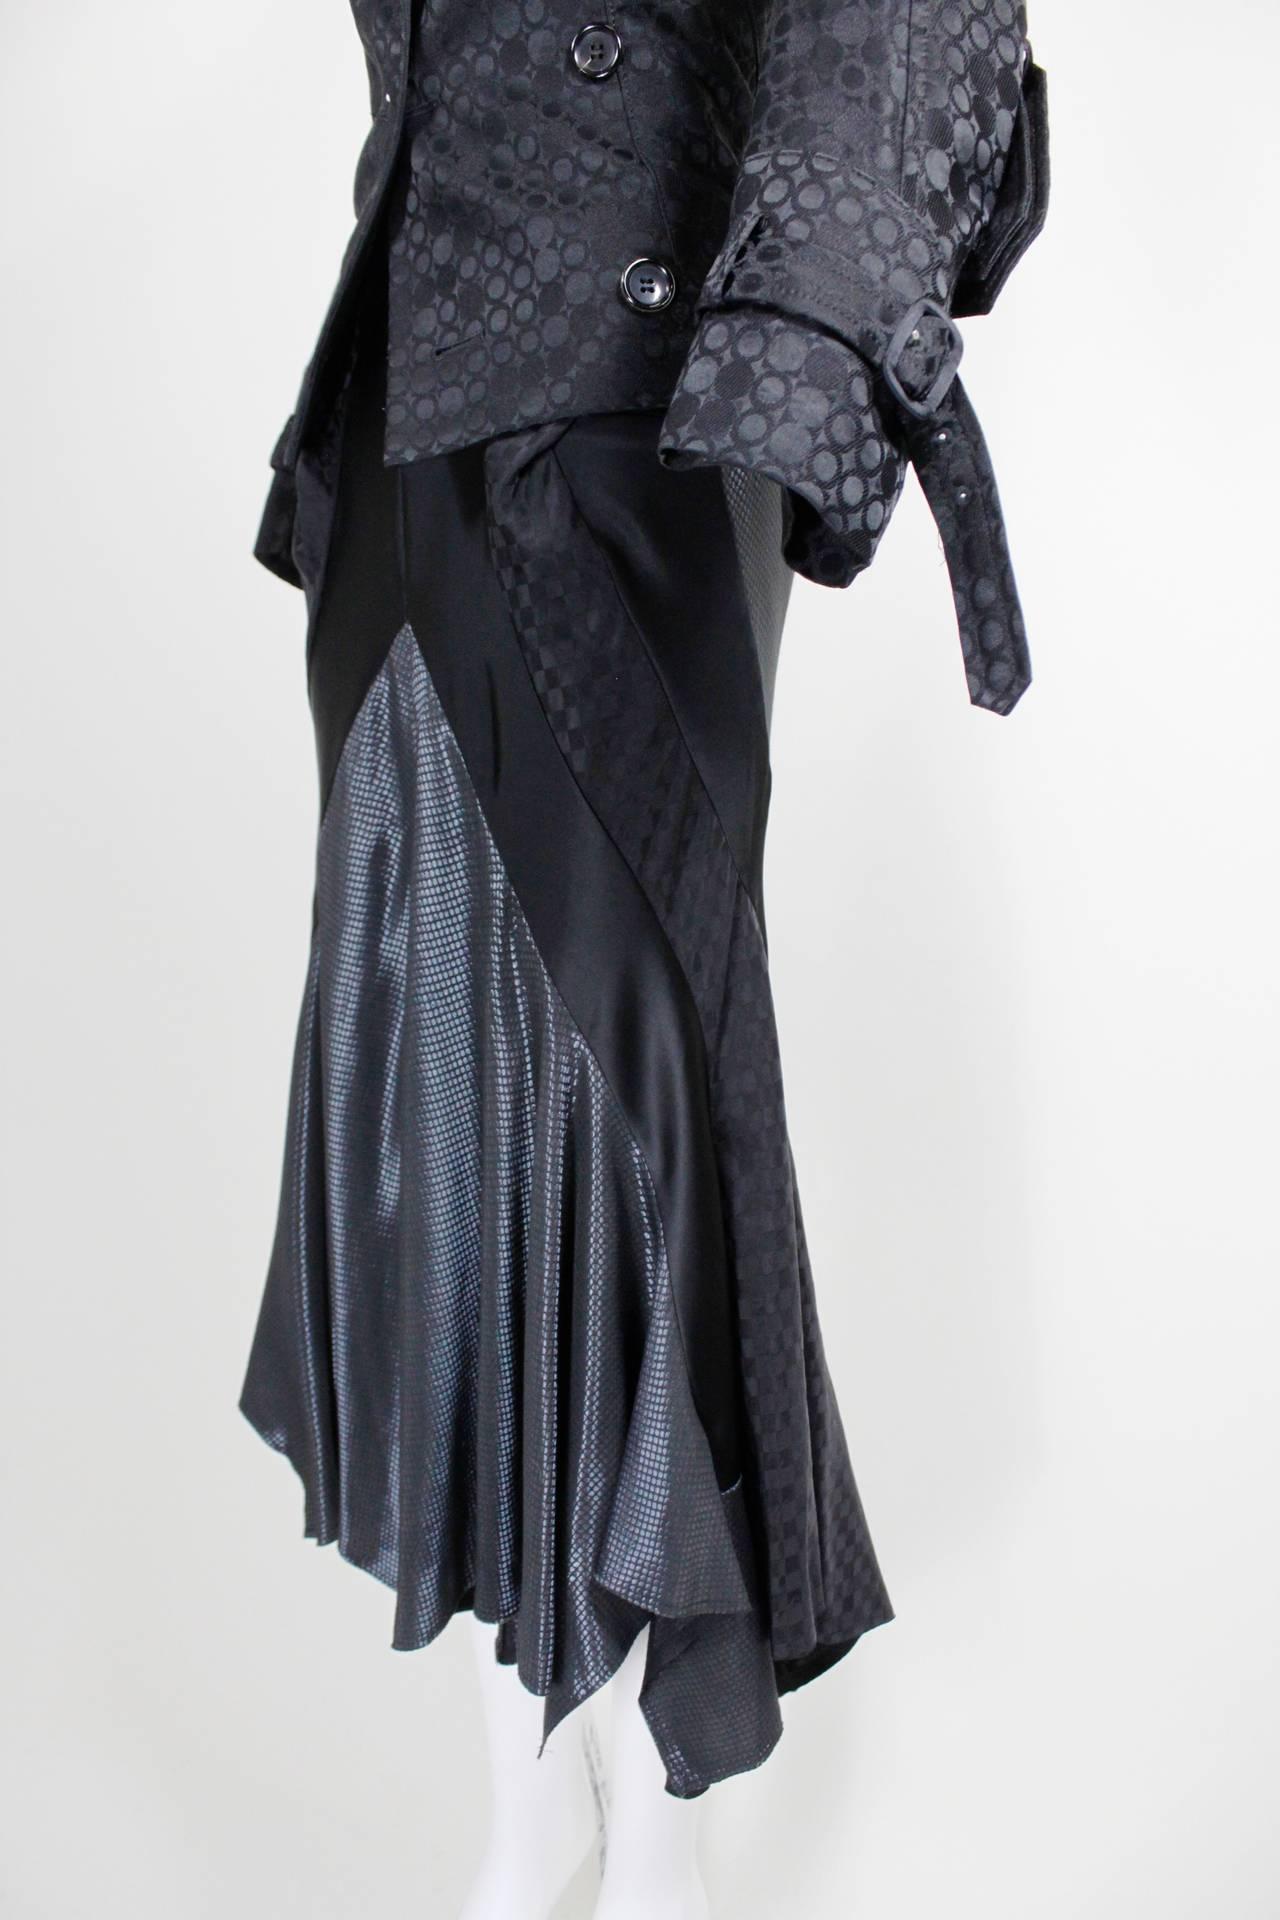 Junya Watanabe for Comme des Garçons Black Asymmetrical Ensemble 8